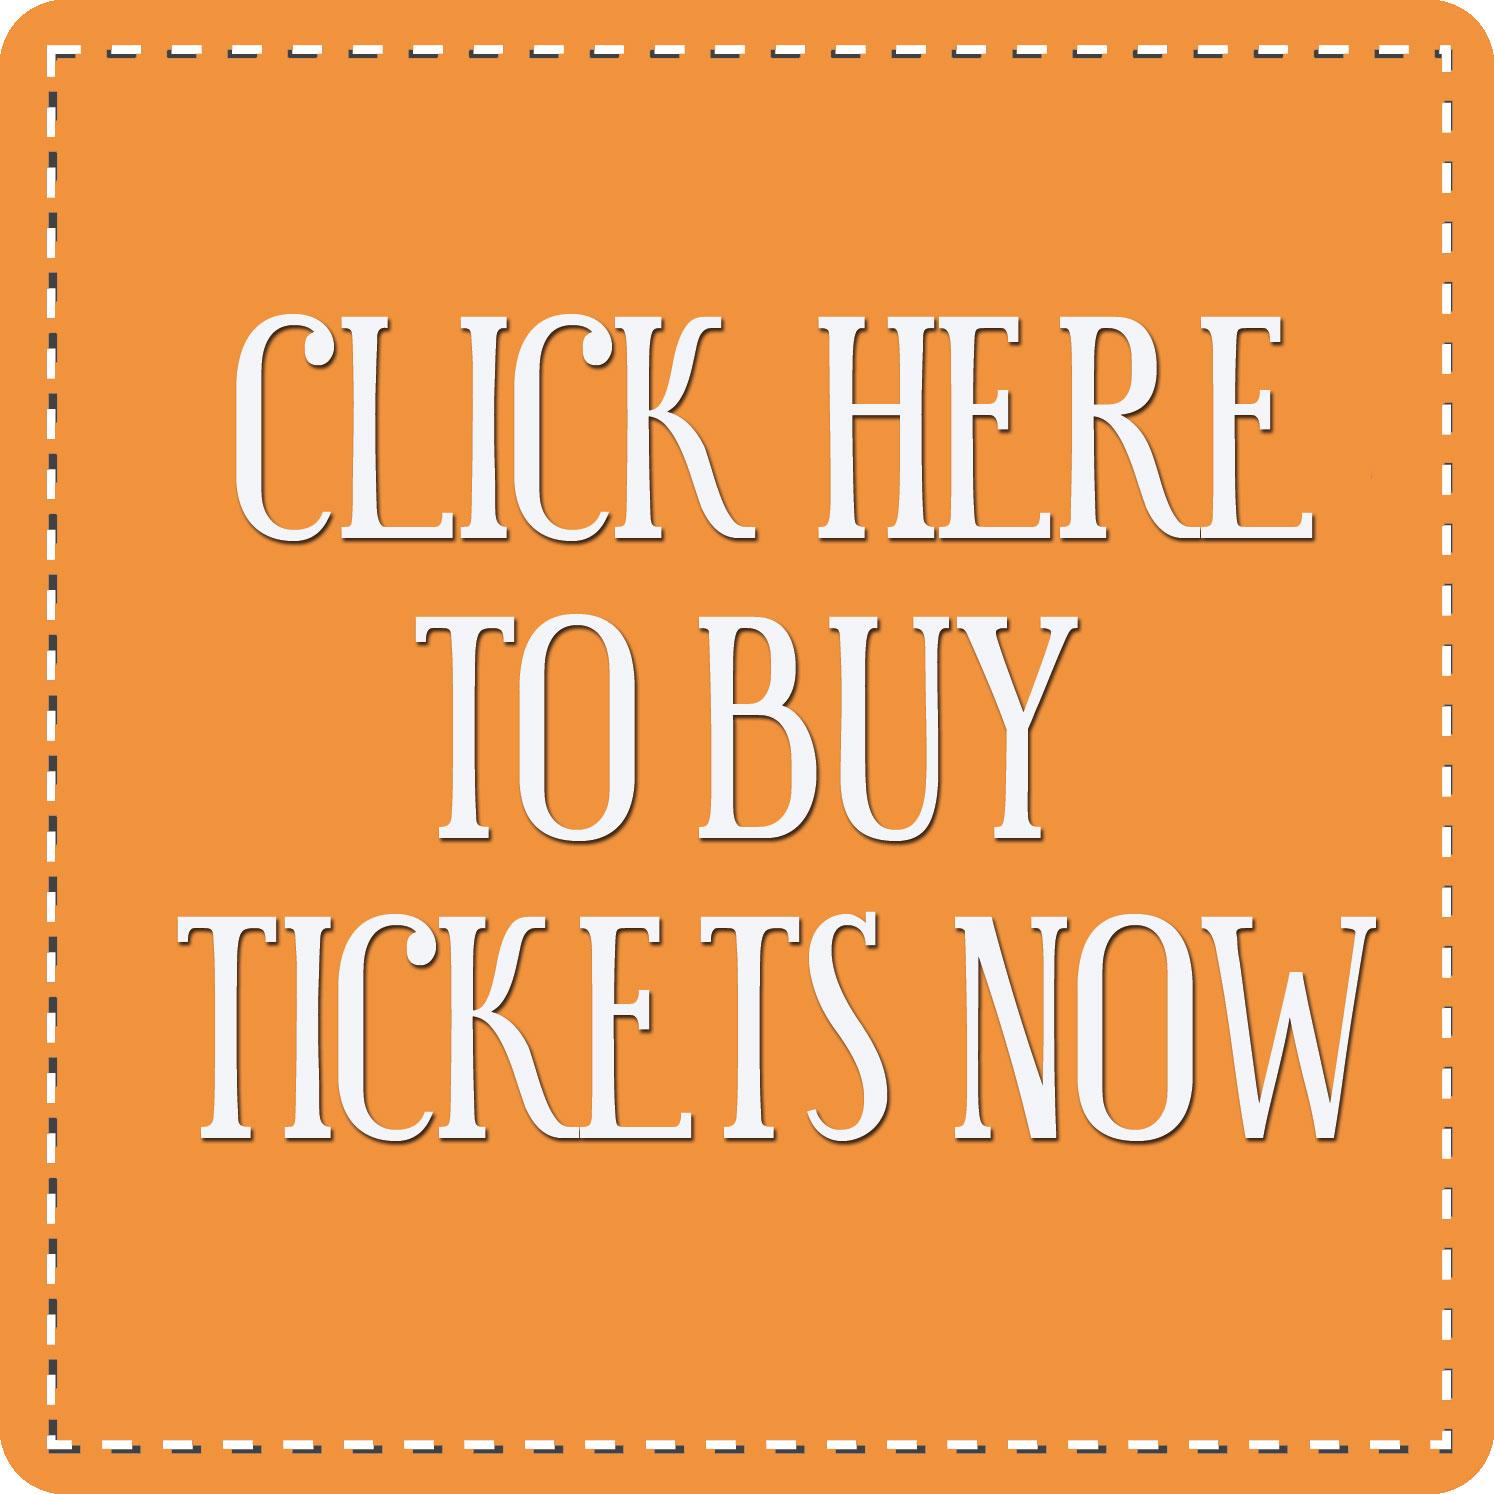 Buy-Tickets-Now-orange.jpg